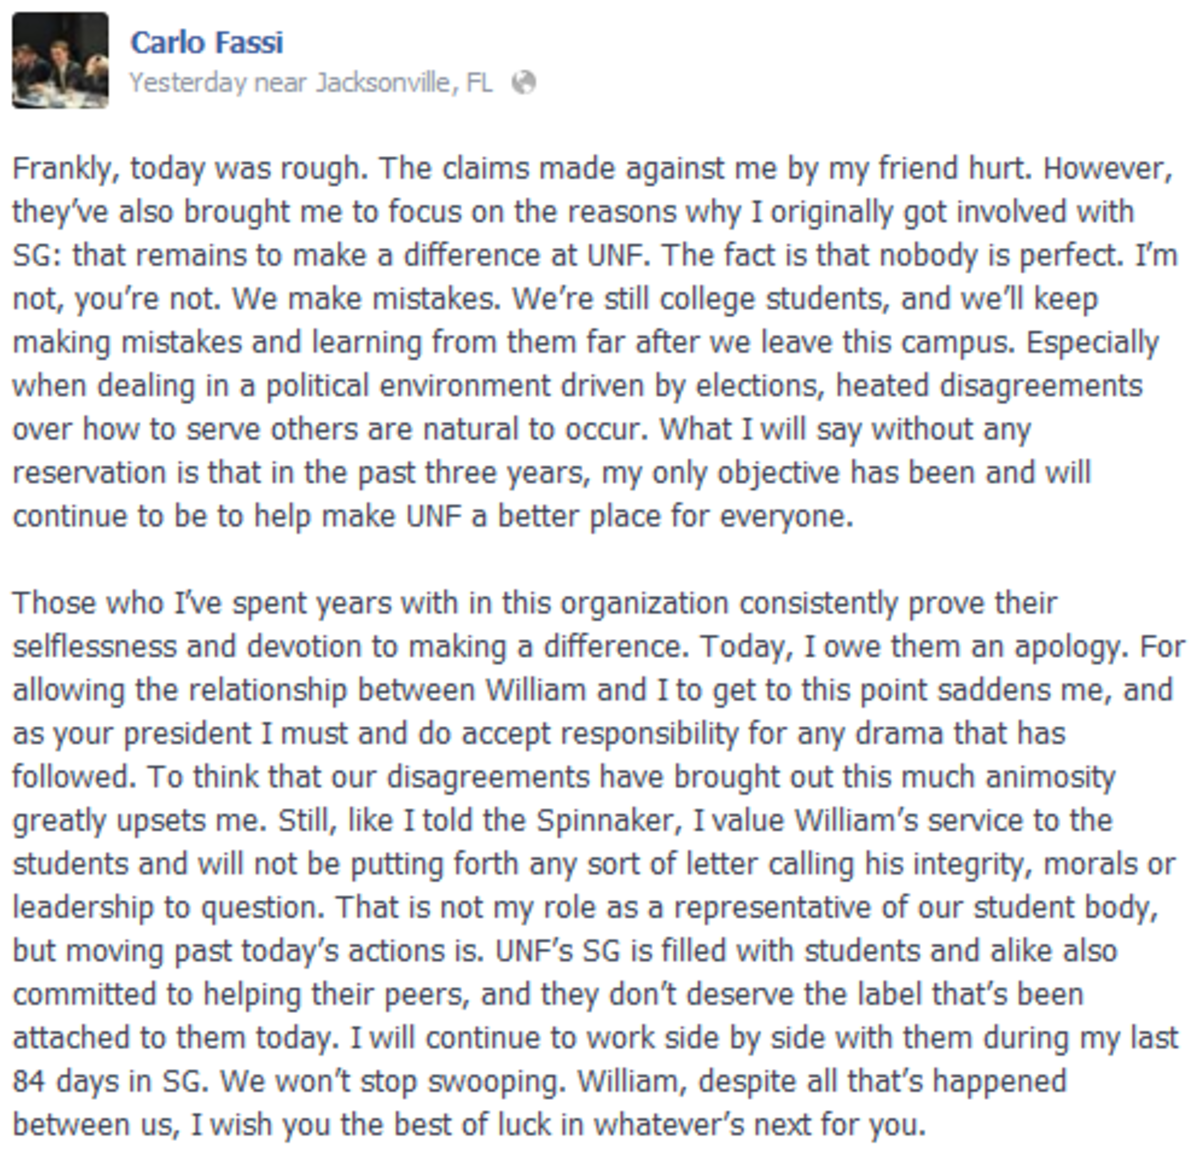 Carlo Fassi's Facebook status the night of Jan. 21.